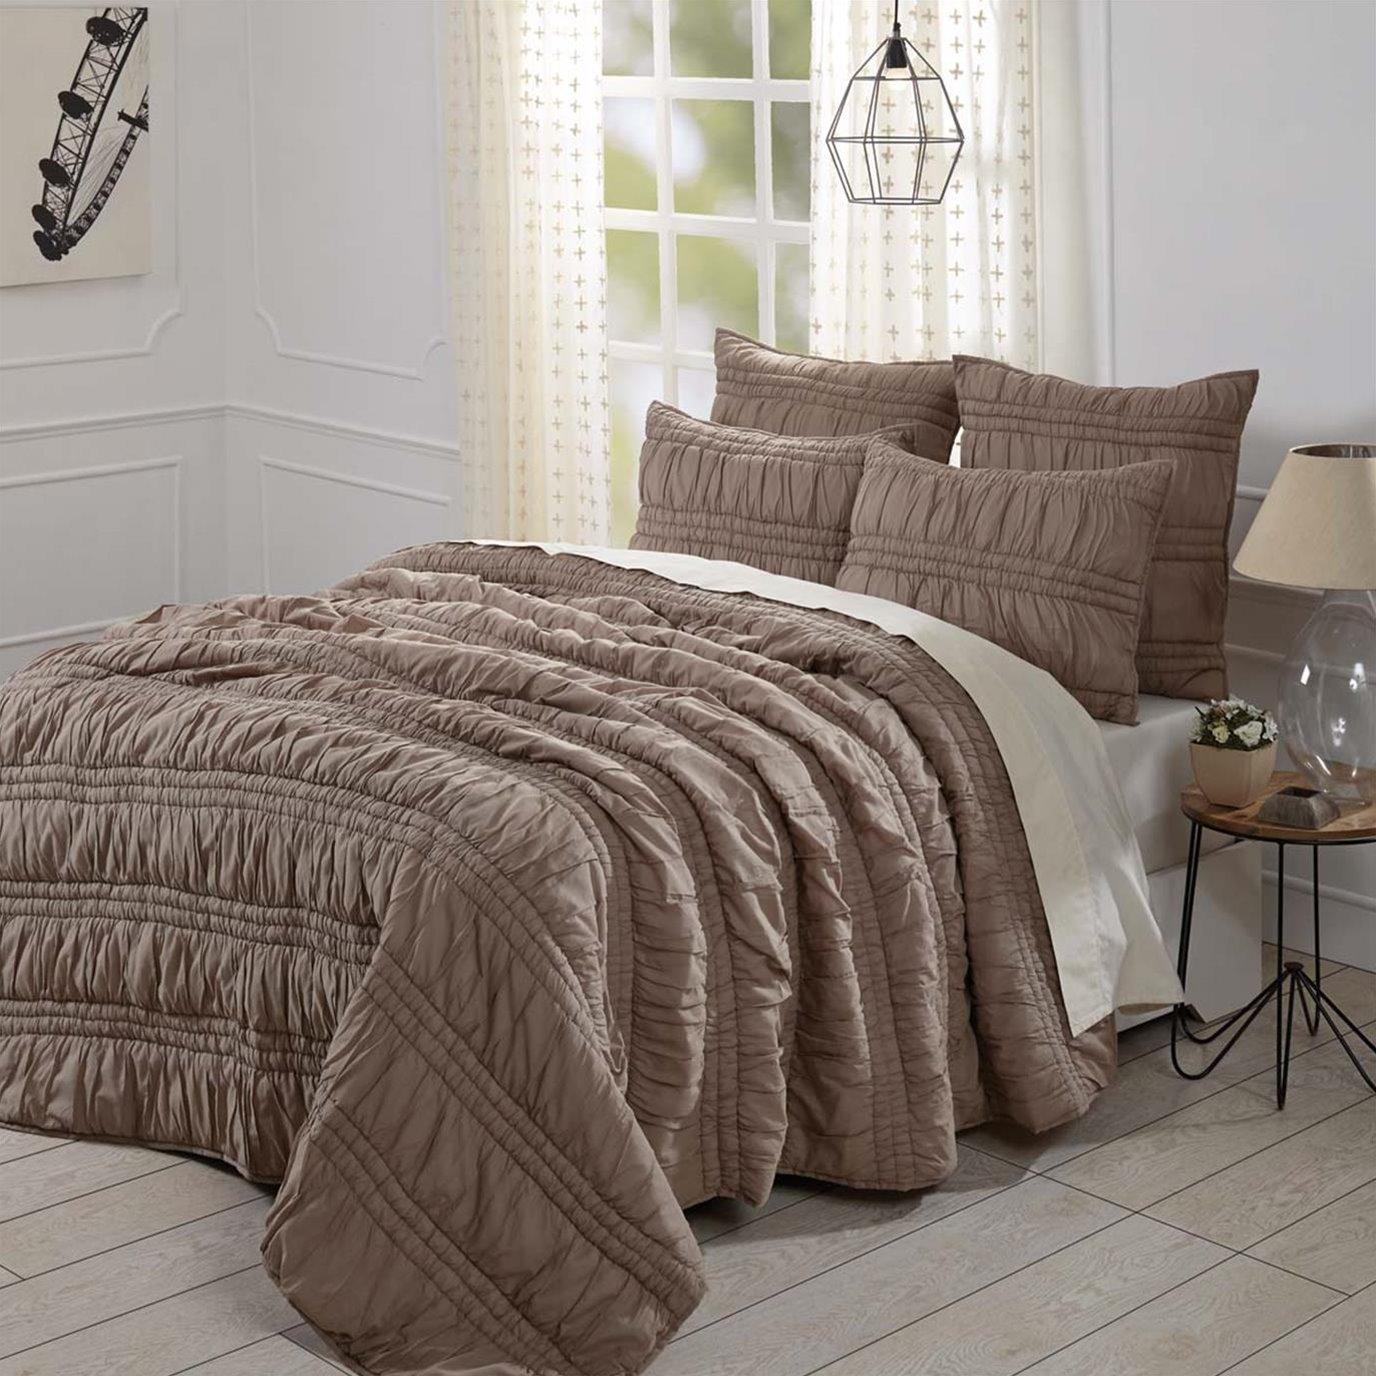 Natasha Warm Taupe King Set; Quilt 105Wx95L-2 Shams 21x37